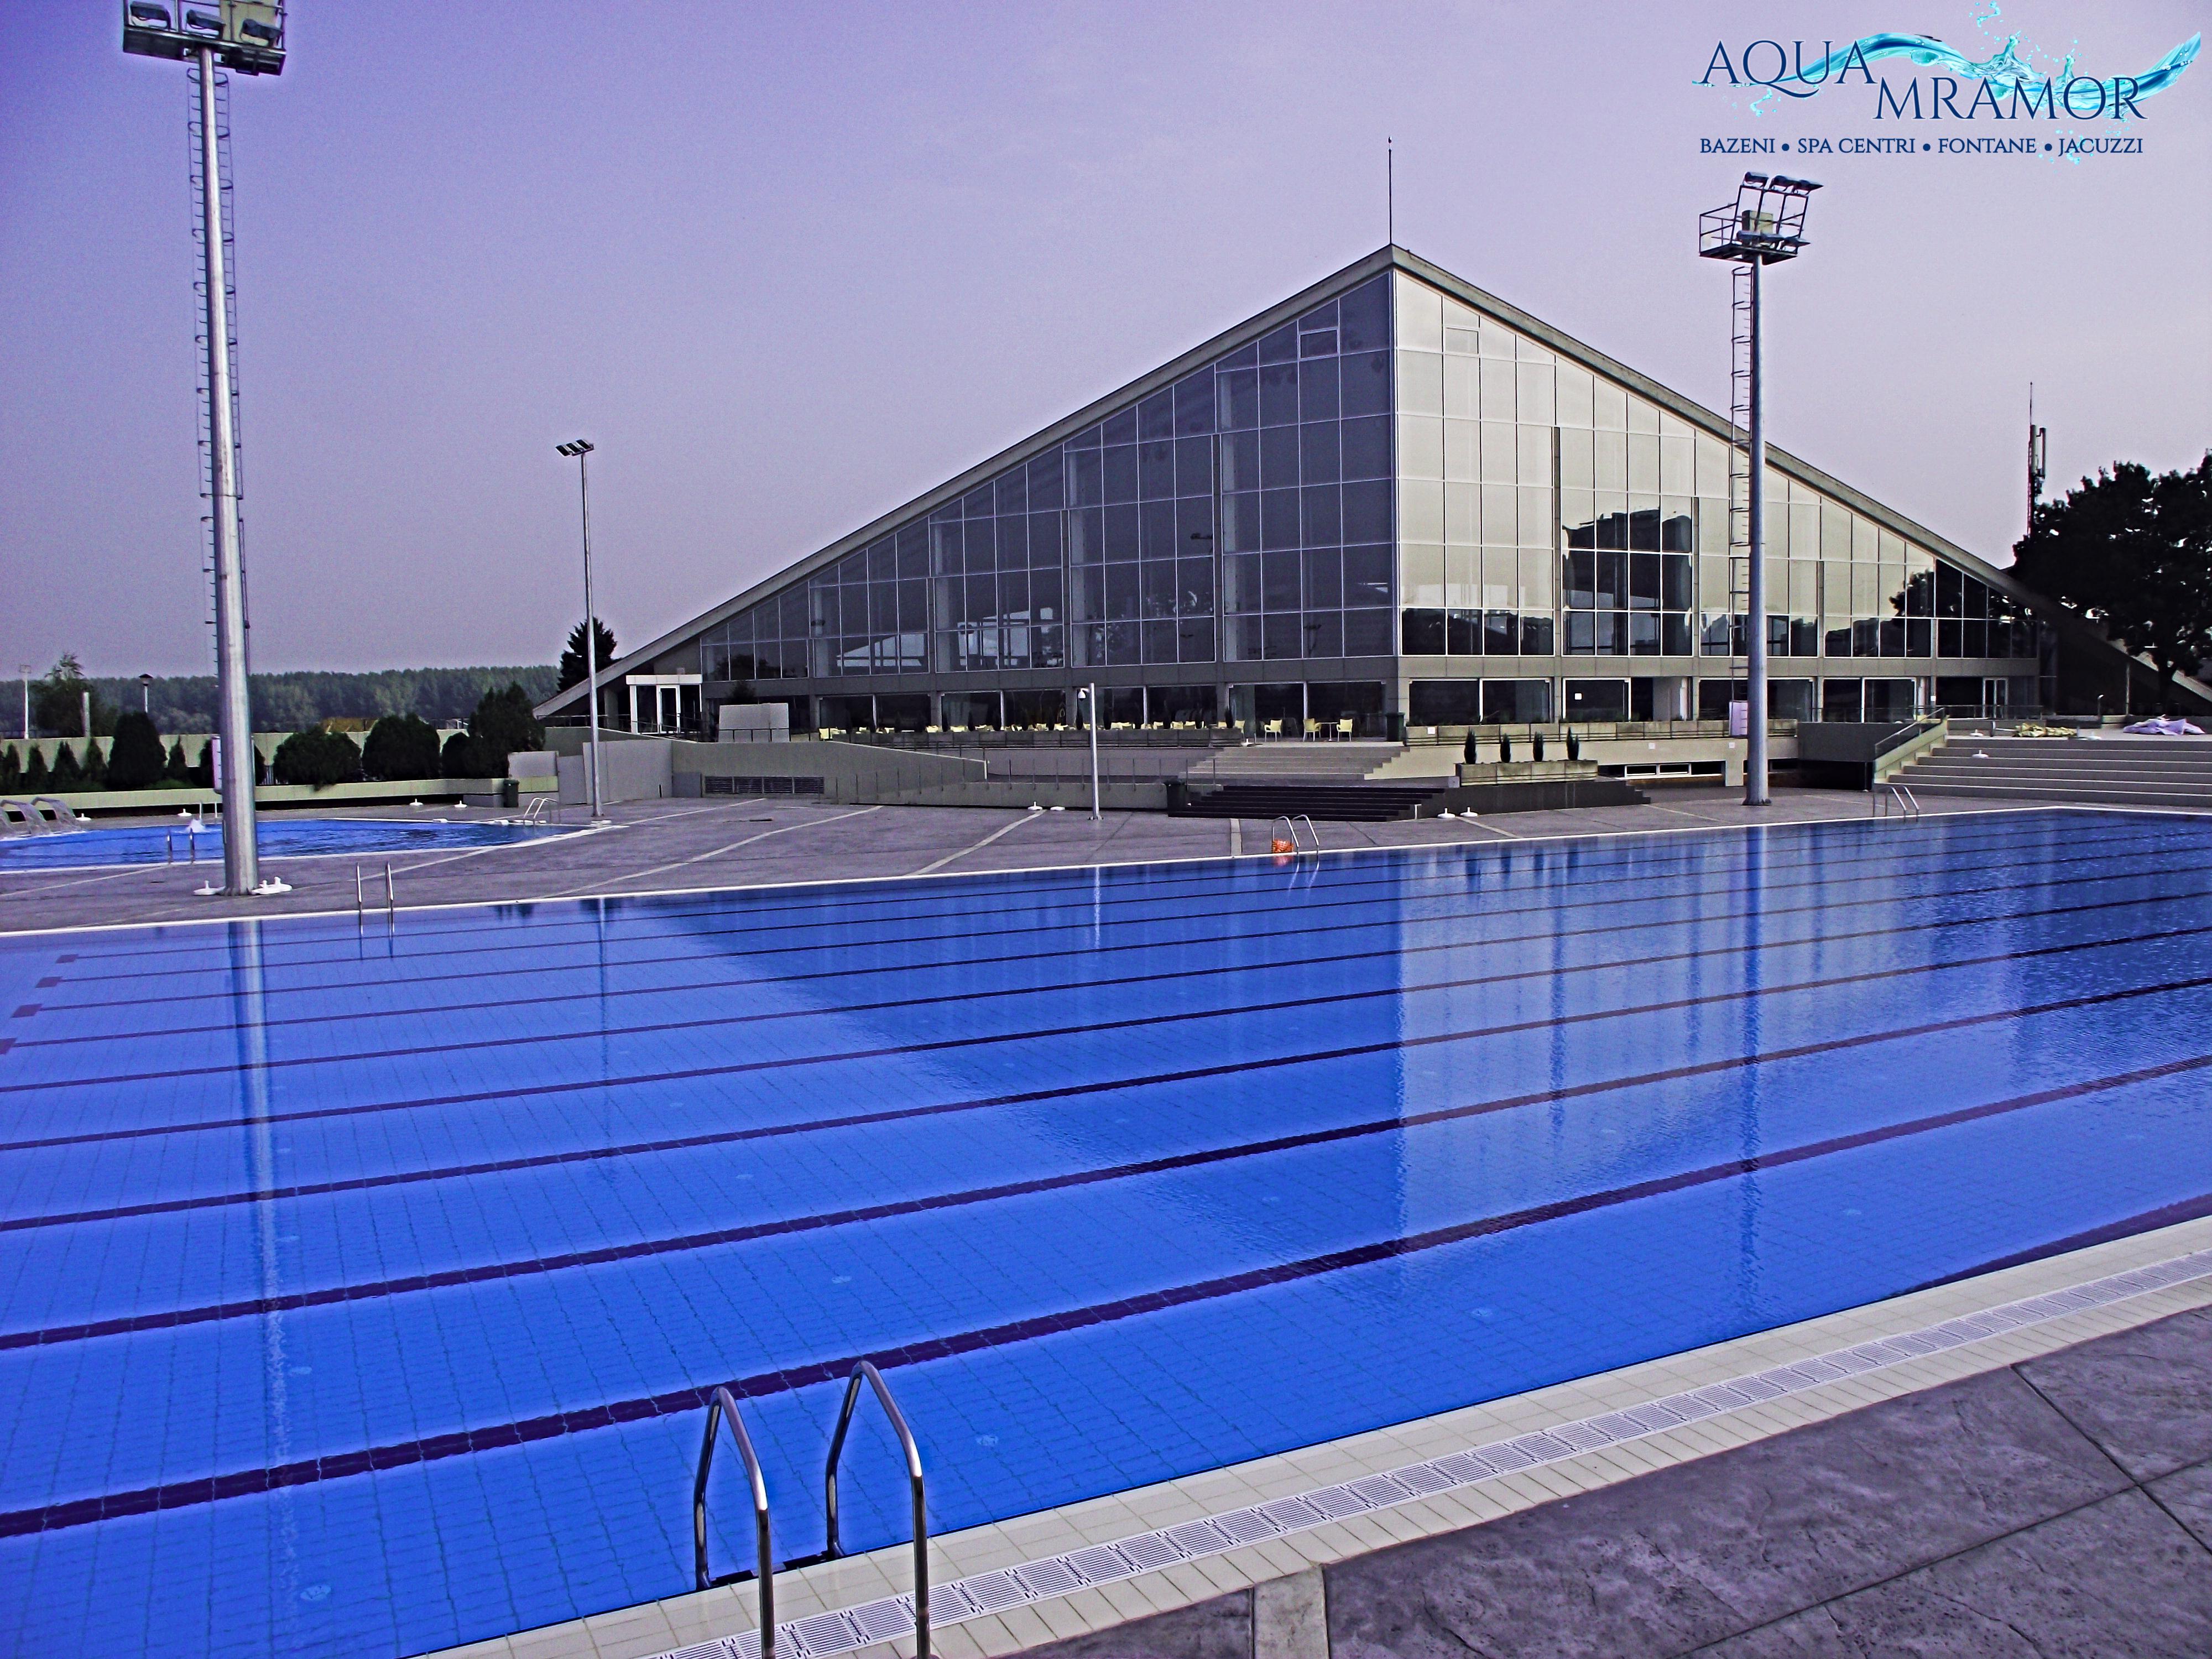 Aqua Mramor - Spoljni bazen 25. maj